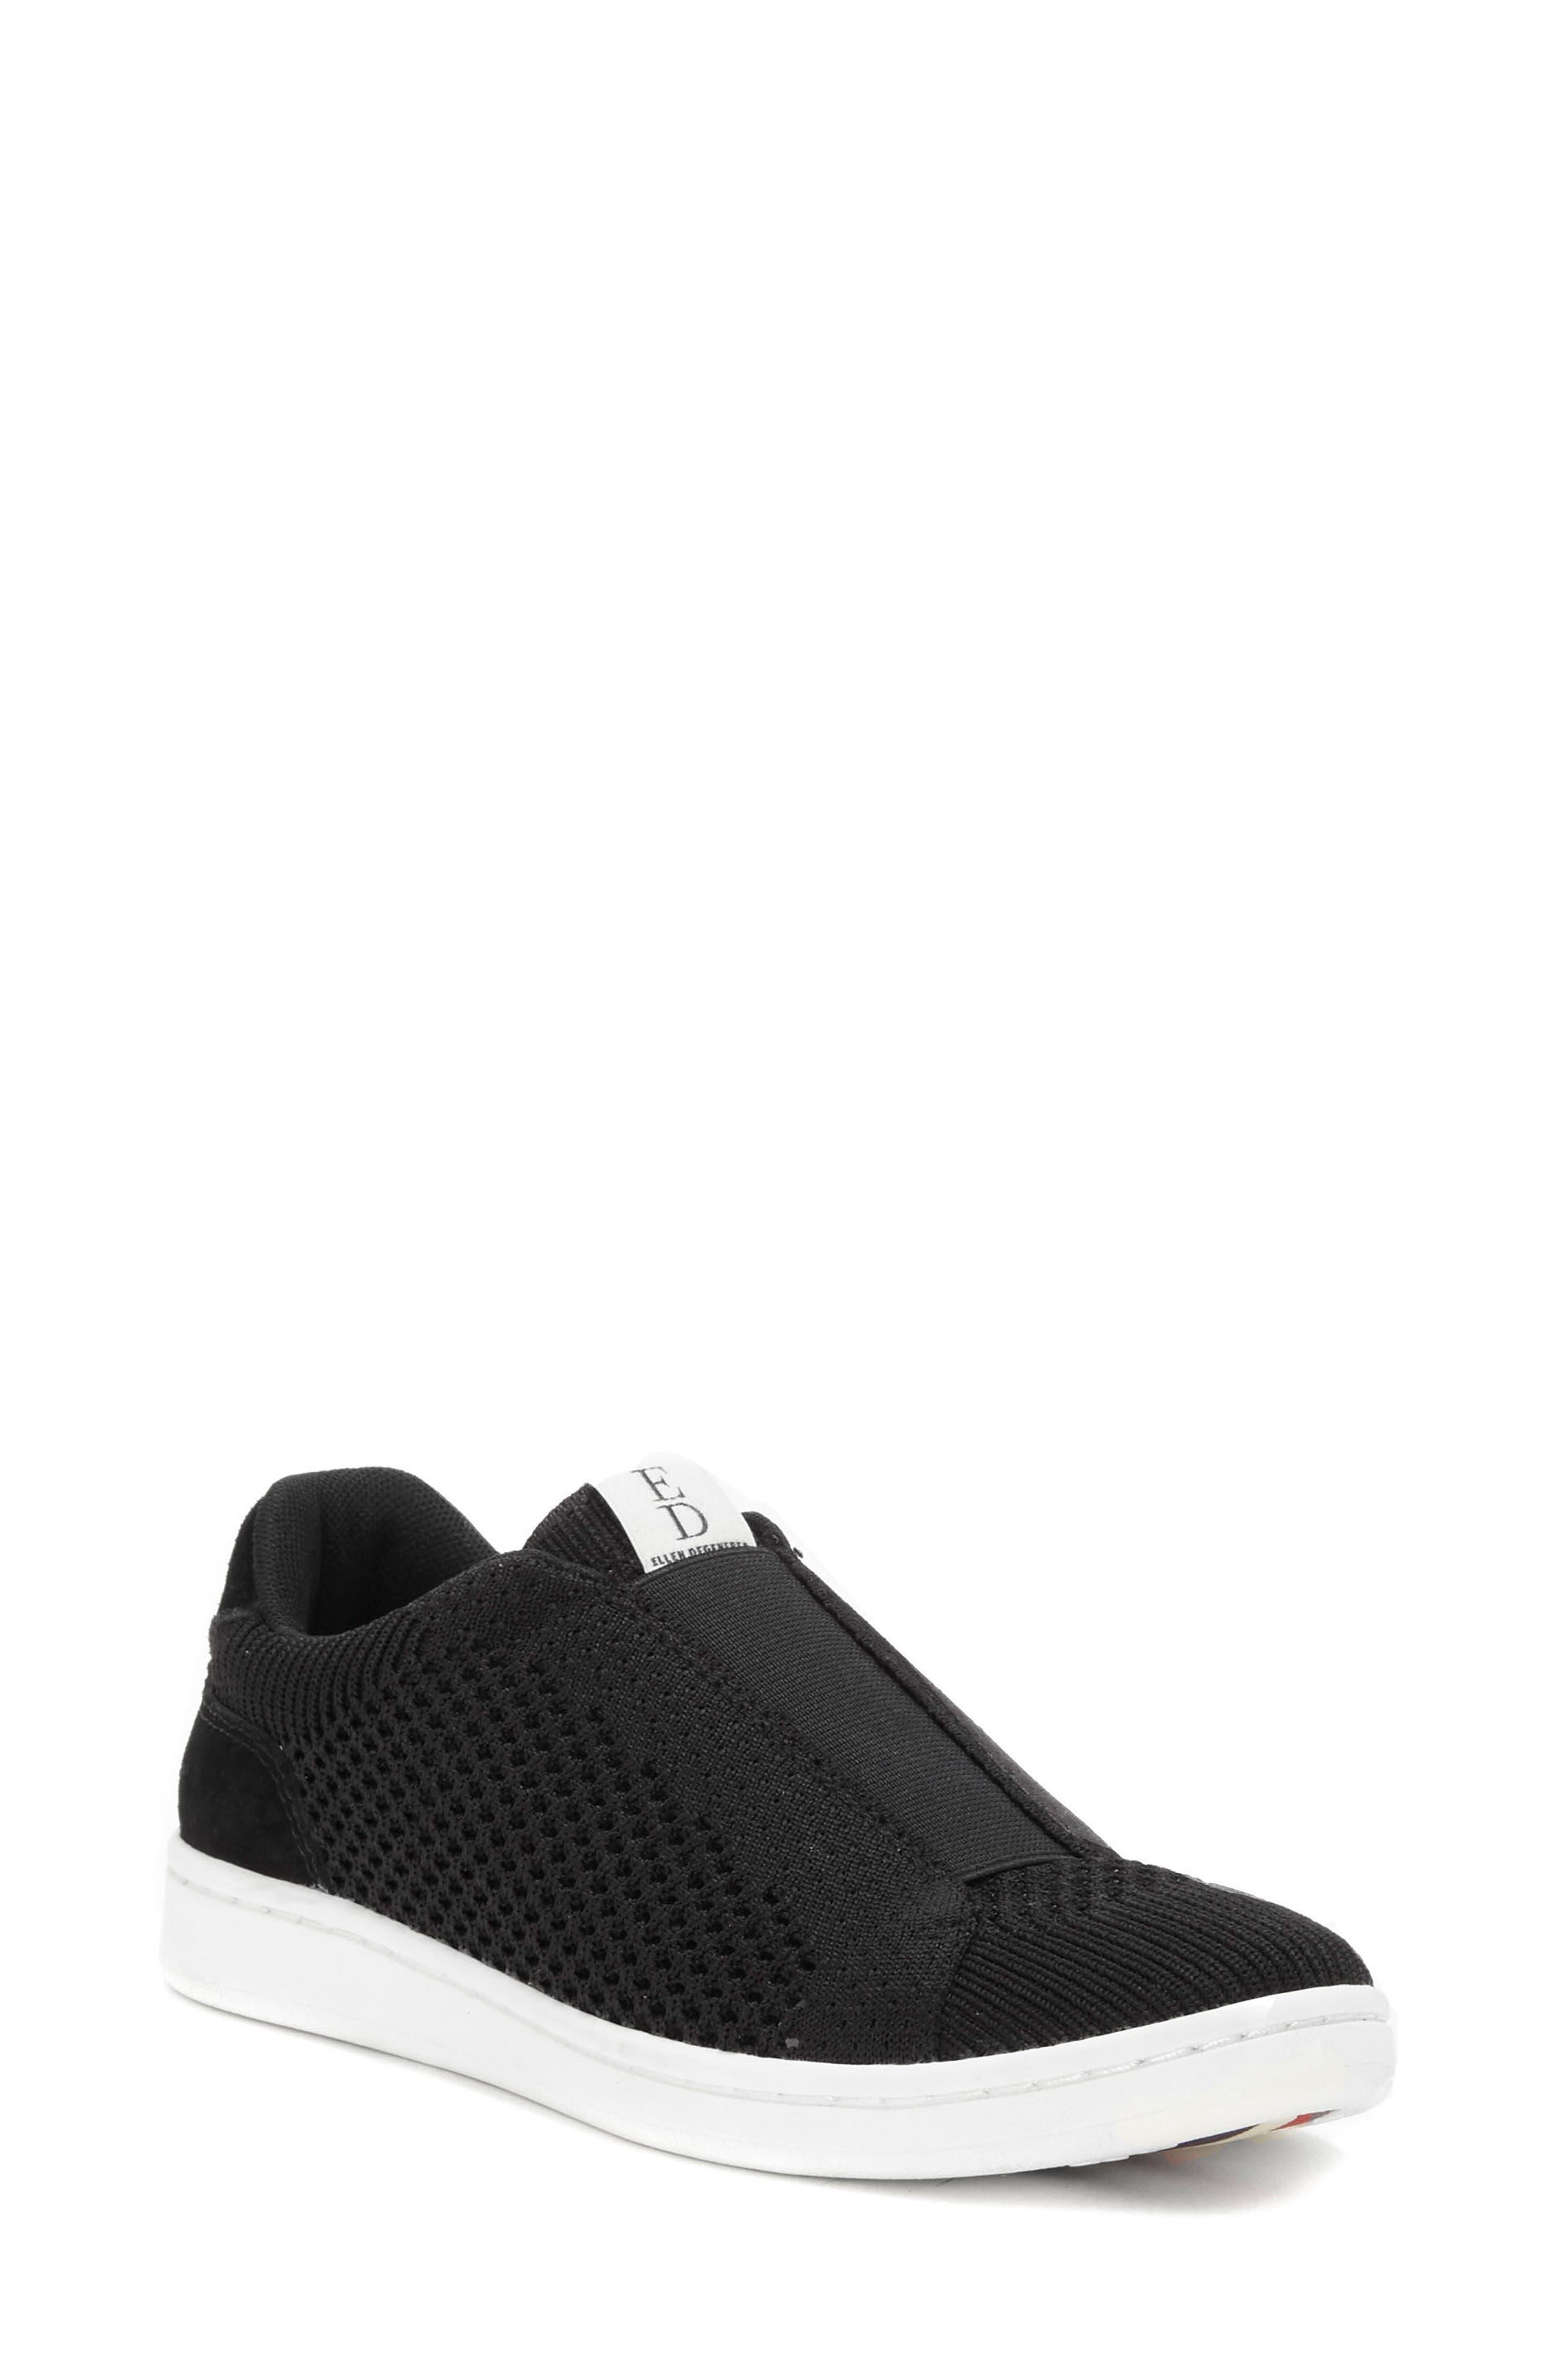 Casbey Slip-On Sneaker,                         Main,                         color, 002